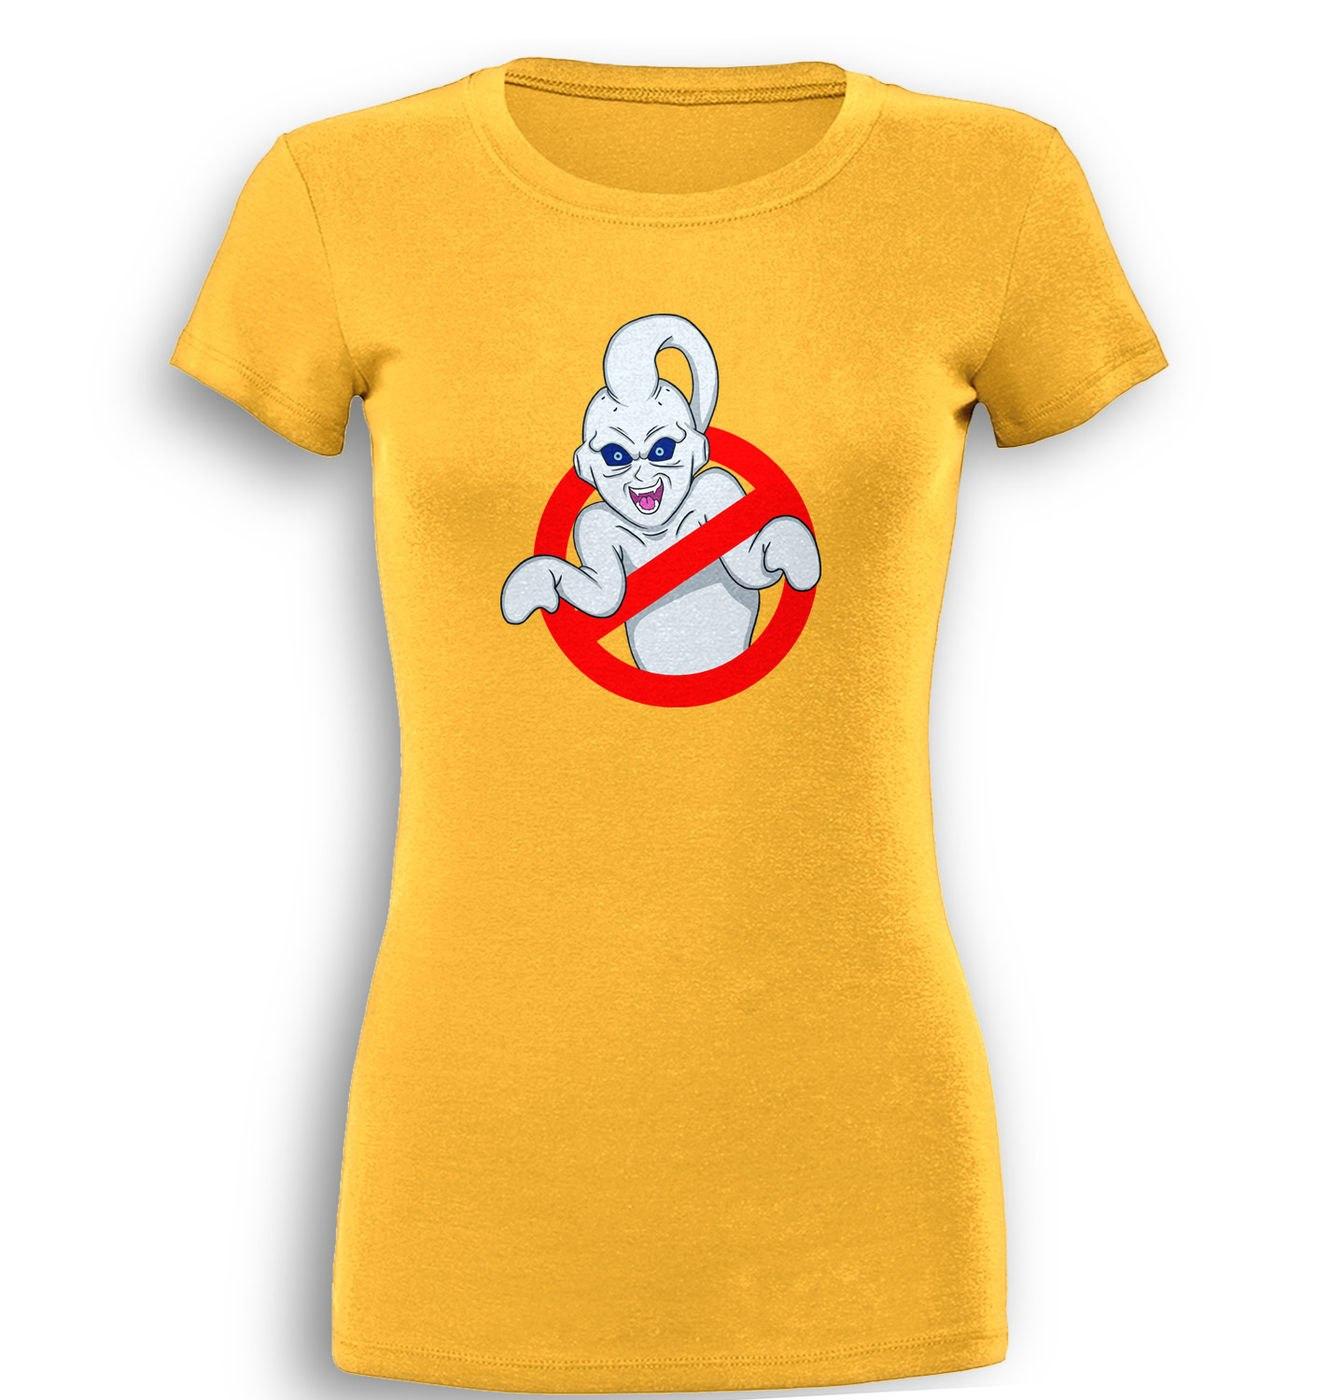 Buu You Gonna Call premium womens t-shirt by Something Geeky